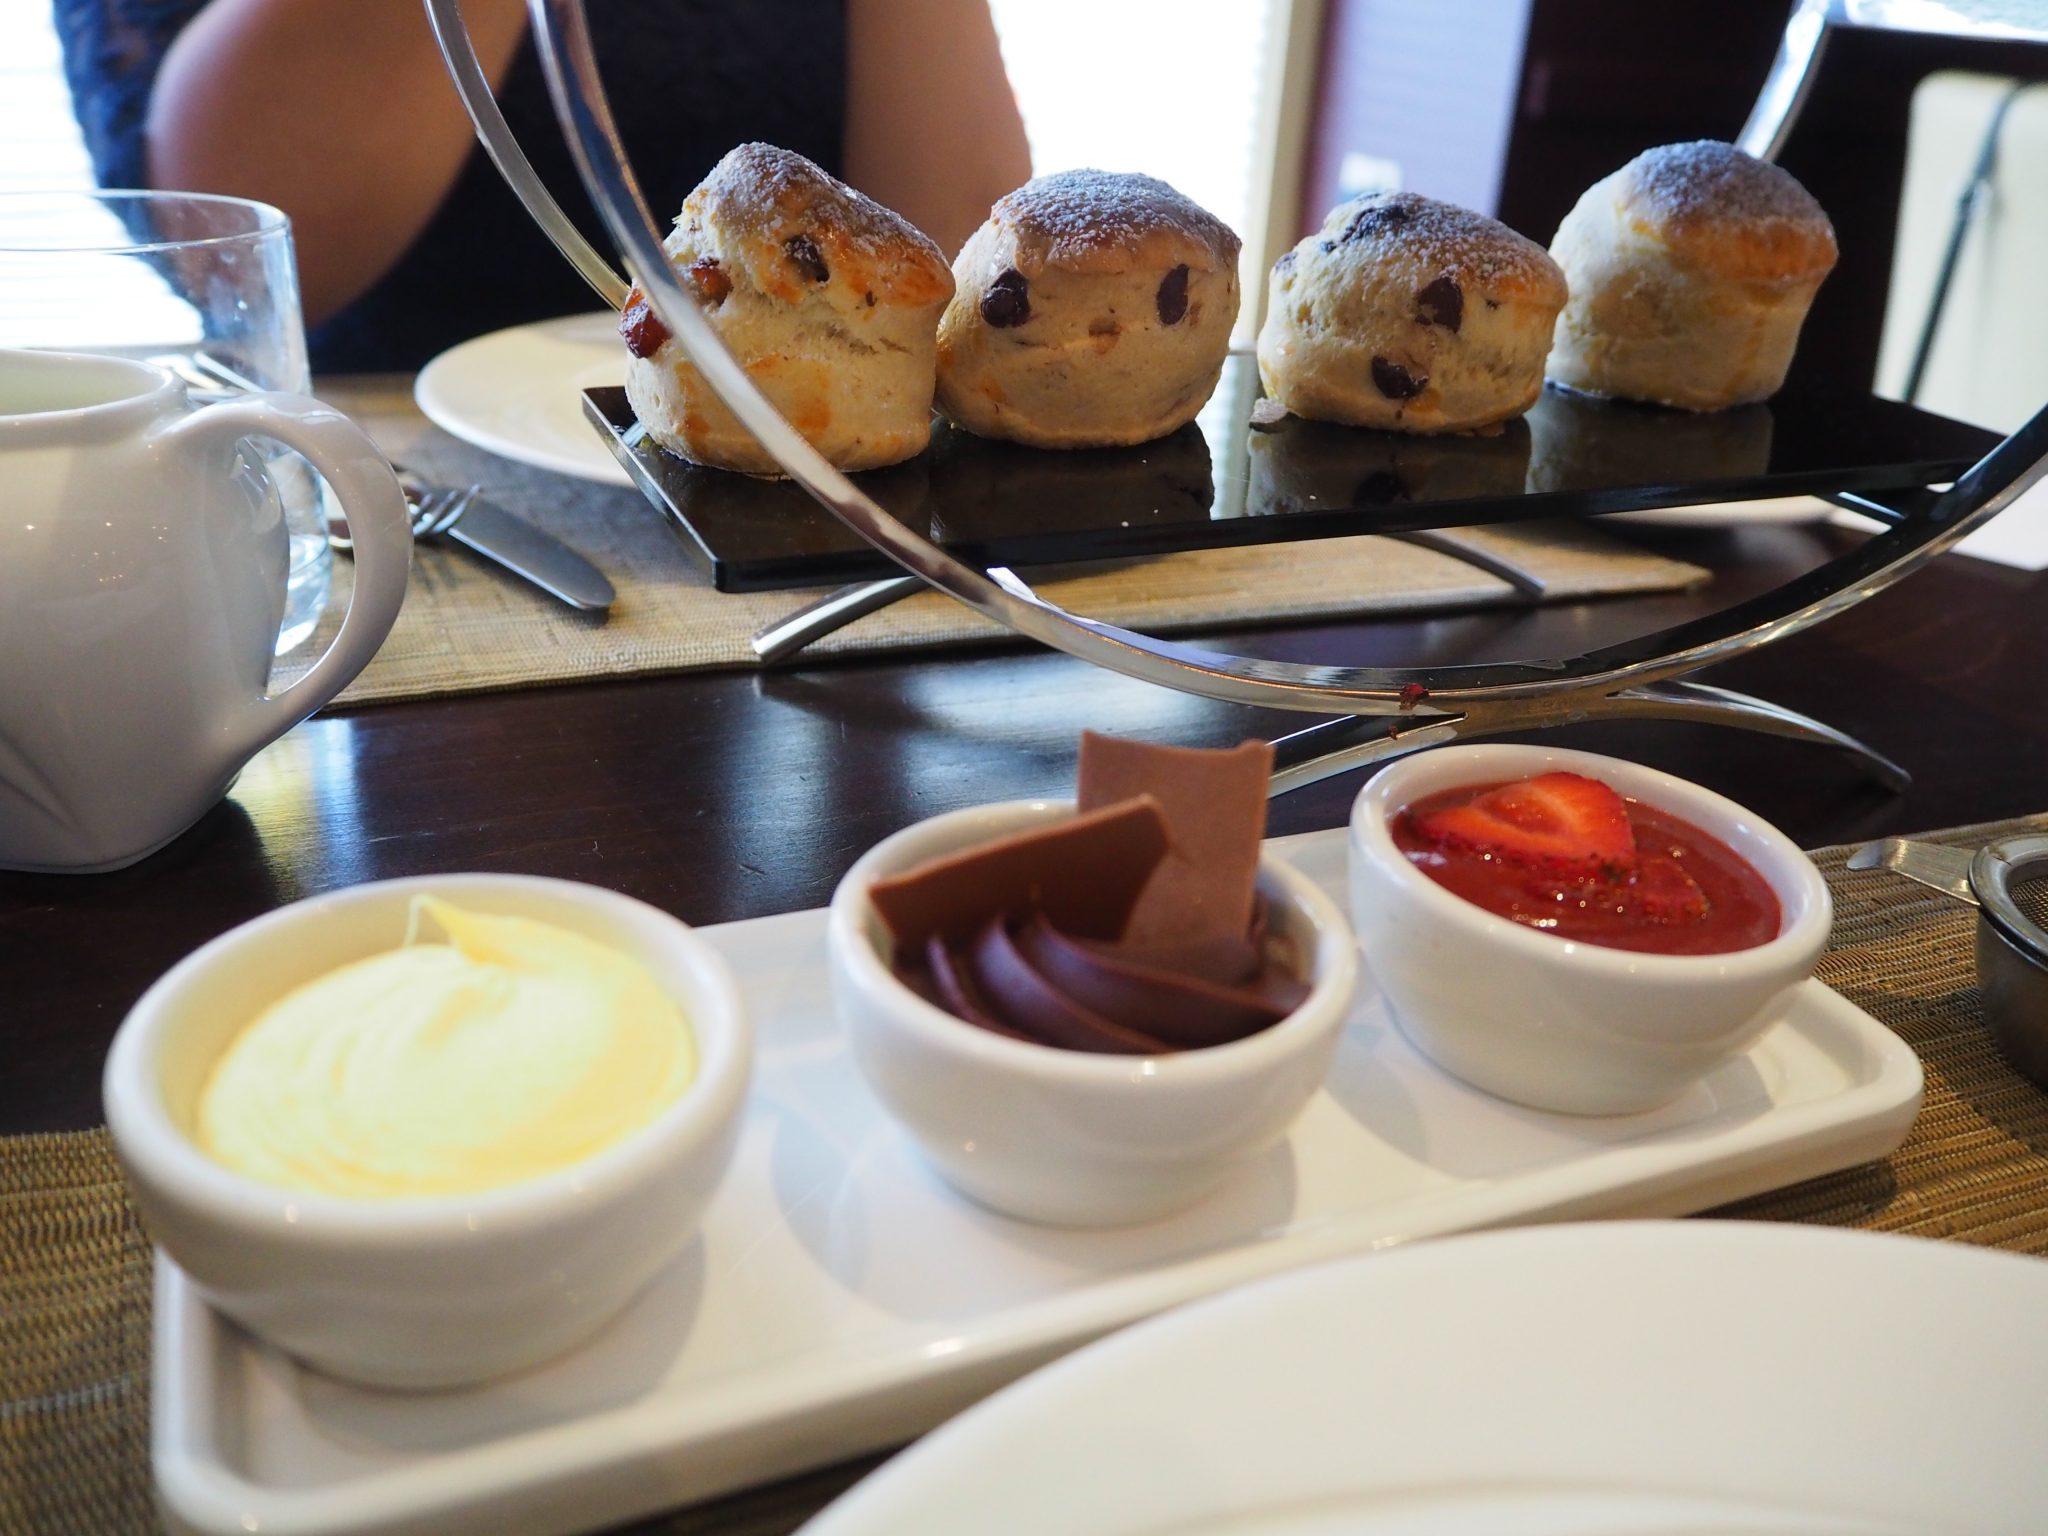 Chocoholic Afternoon Tea at The Hilton Park Lane - Scones